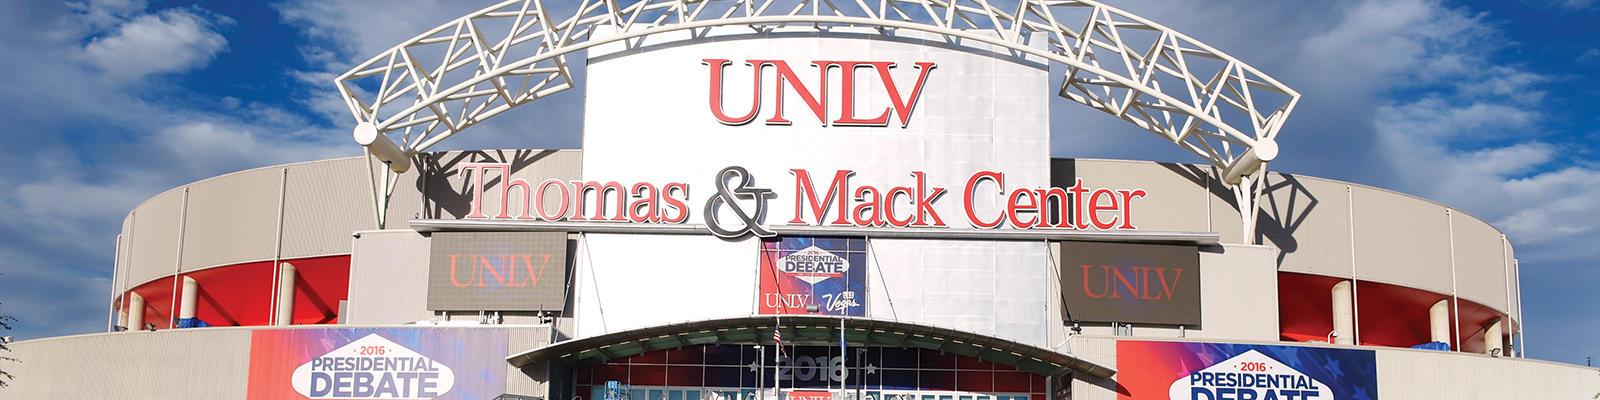 UNLV Thomas & Mack Center